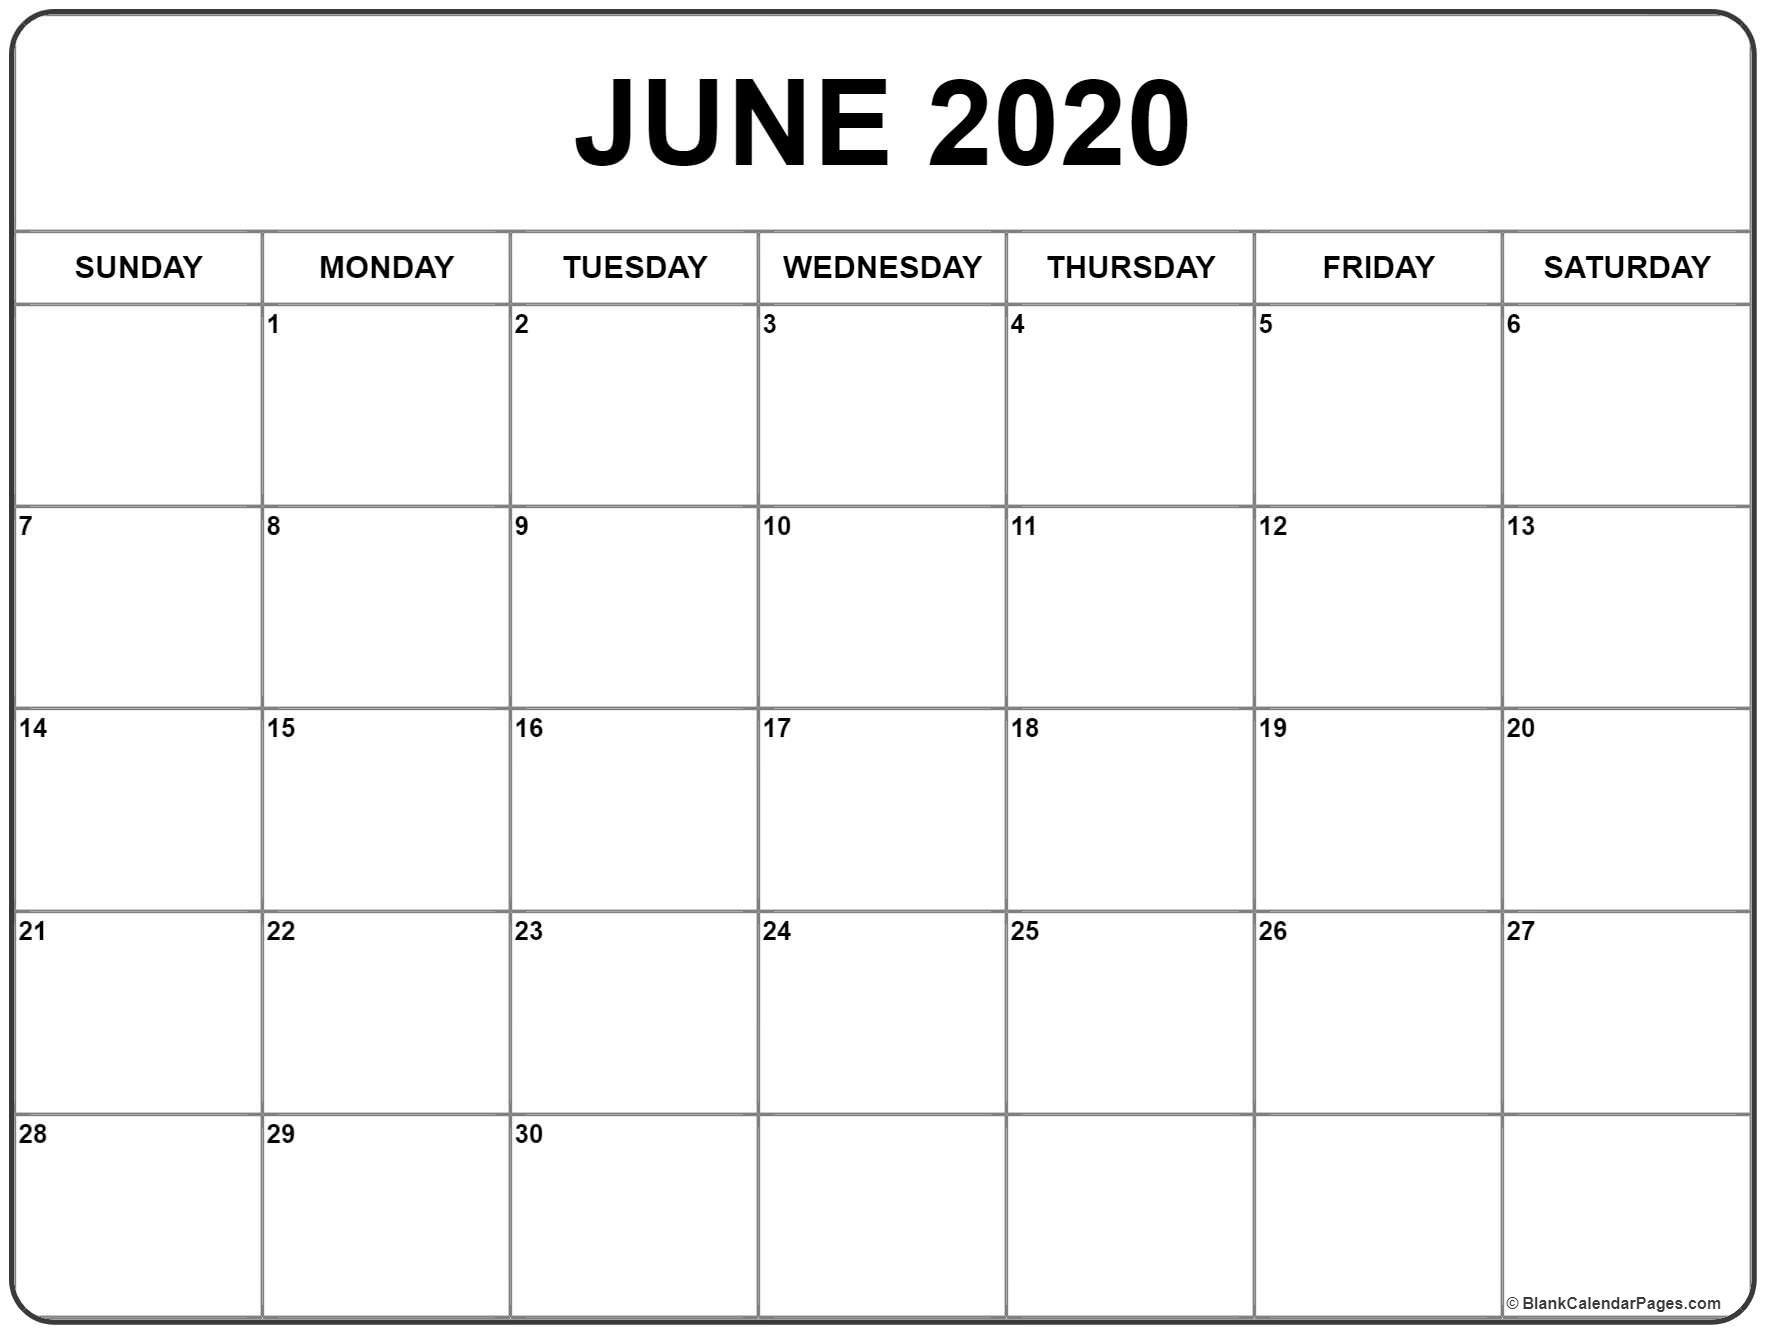 June 2020 Calendar | Free Printable Monthly Calendars